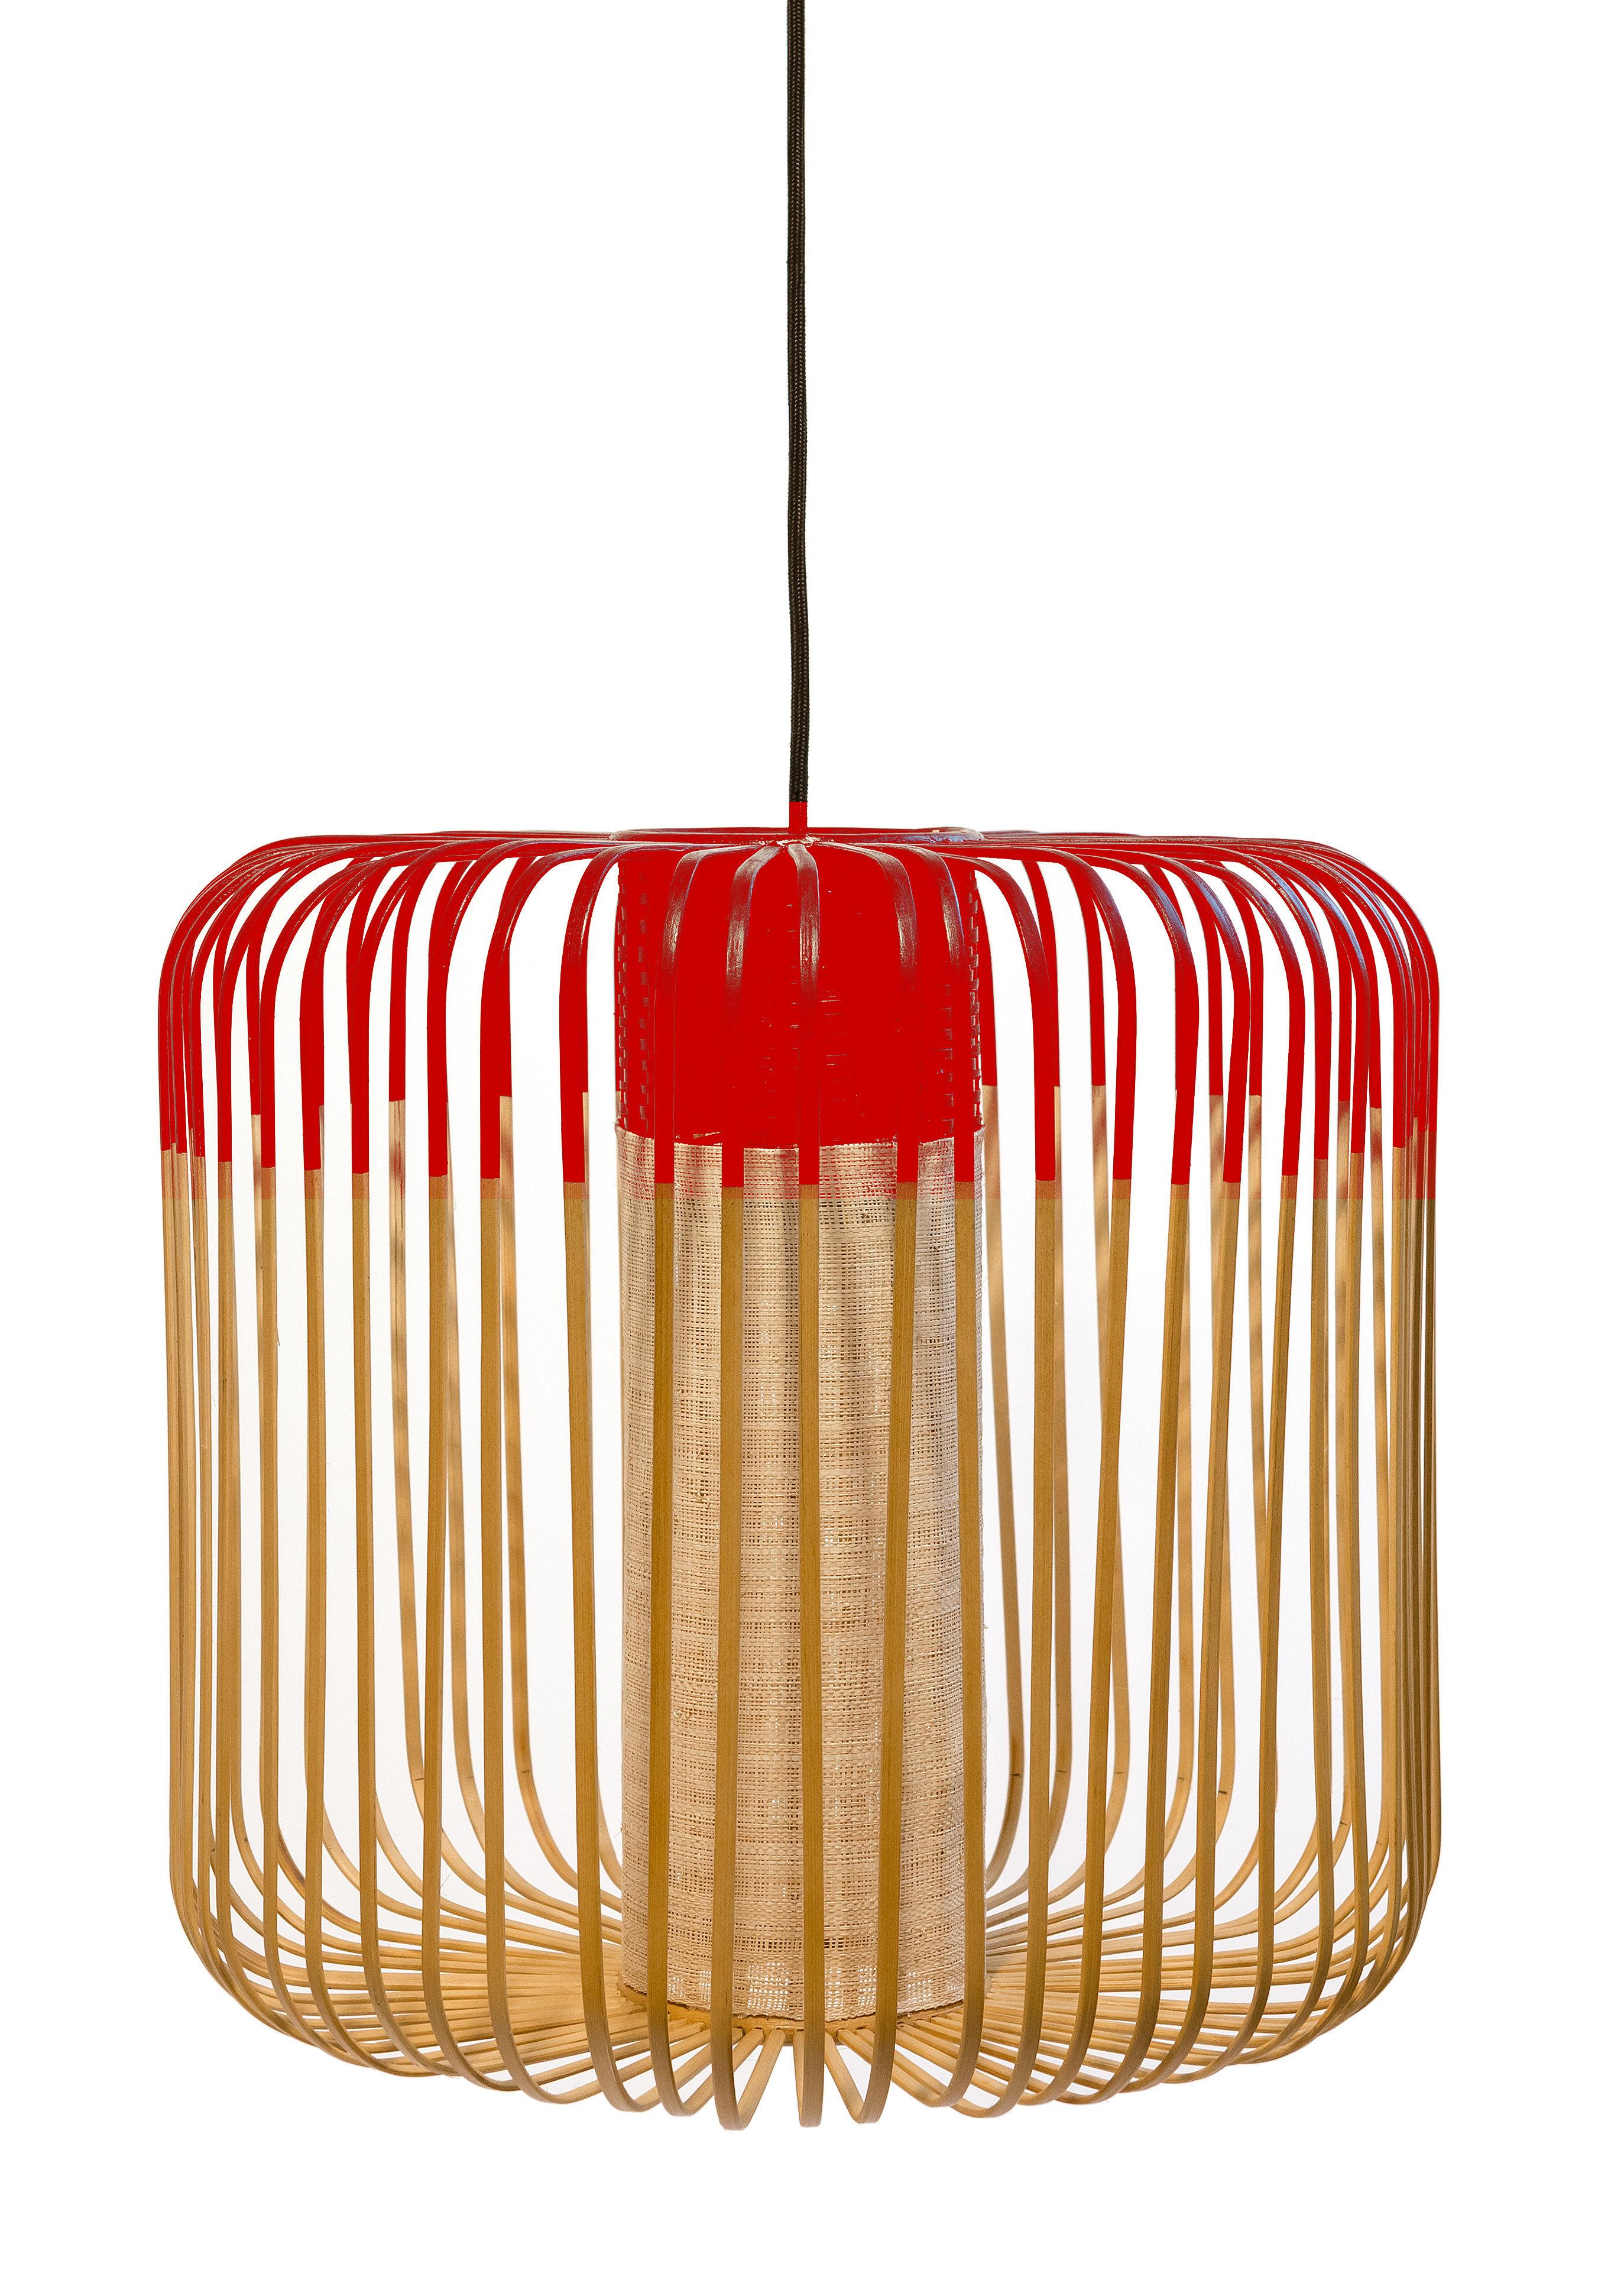 suspension bamboo light m outdoor h 40 x 45 cm rouge naturel forestier. Black Bedroom Furniture Sets. Home Design Ideas